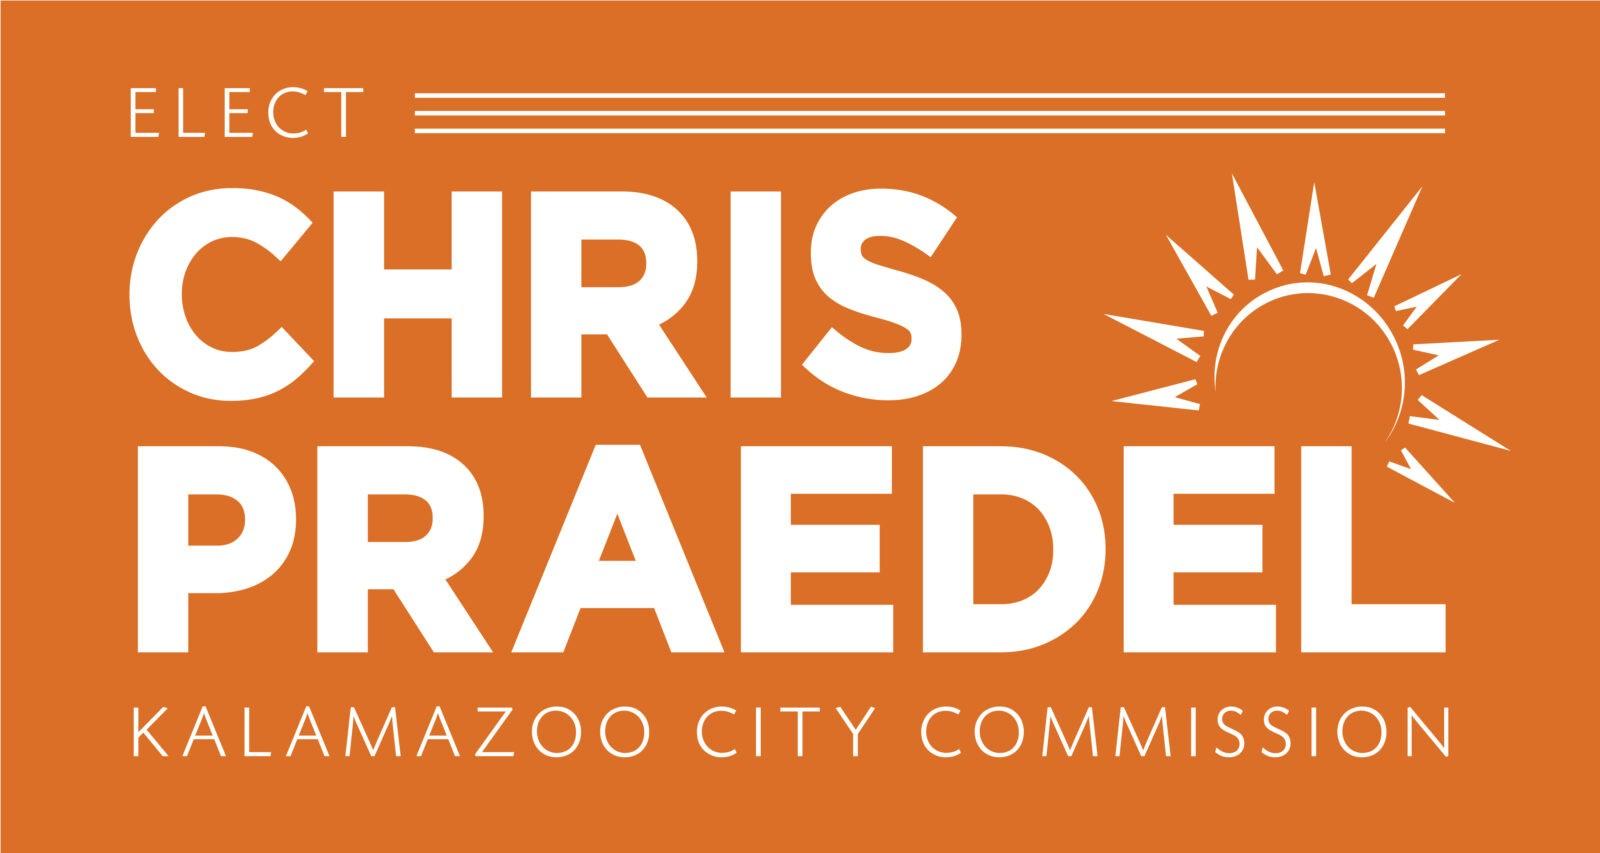 Chris Praedel for Kalamazoo City Commission